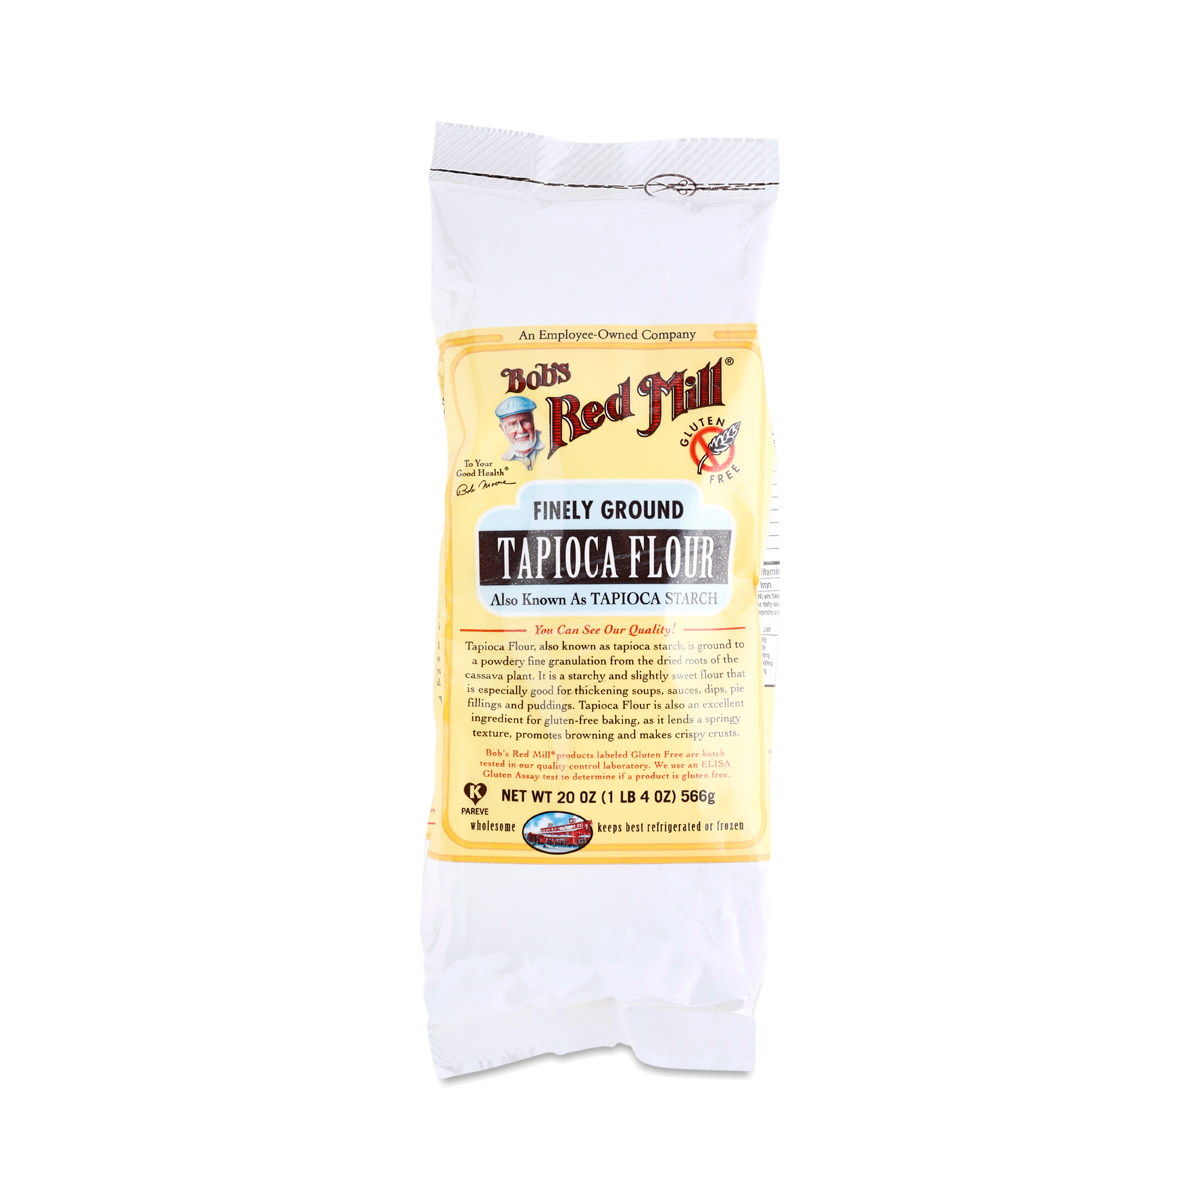 Tapioca Flour by Bob's Red Mill - Thrive Market